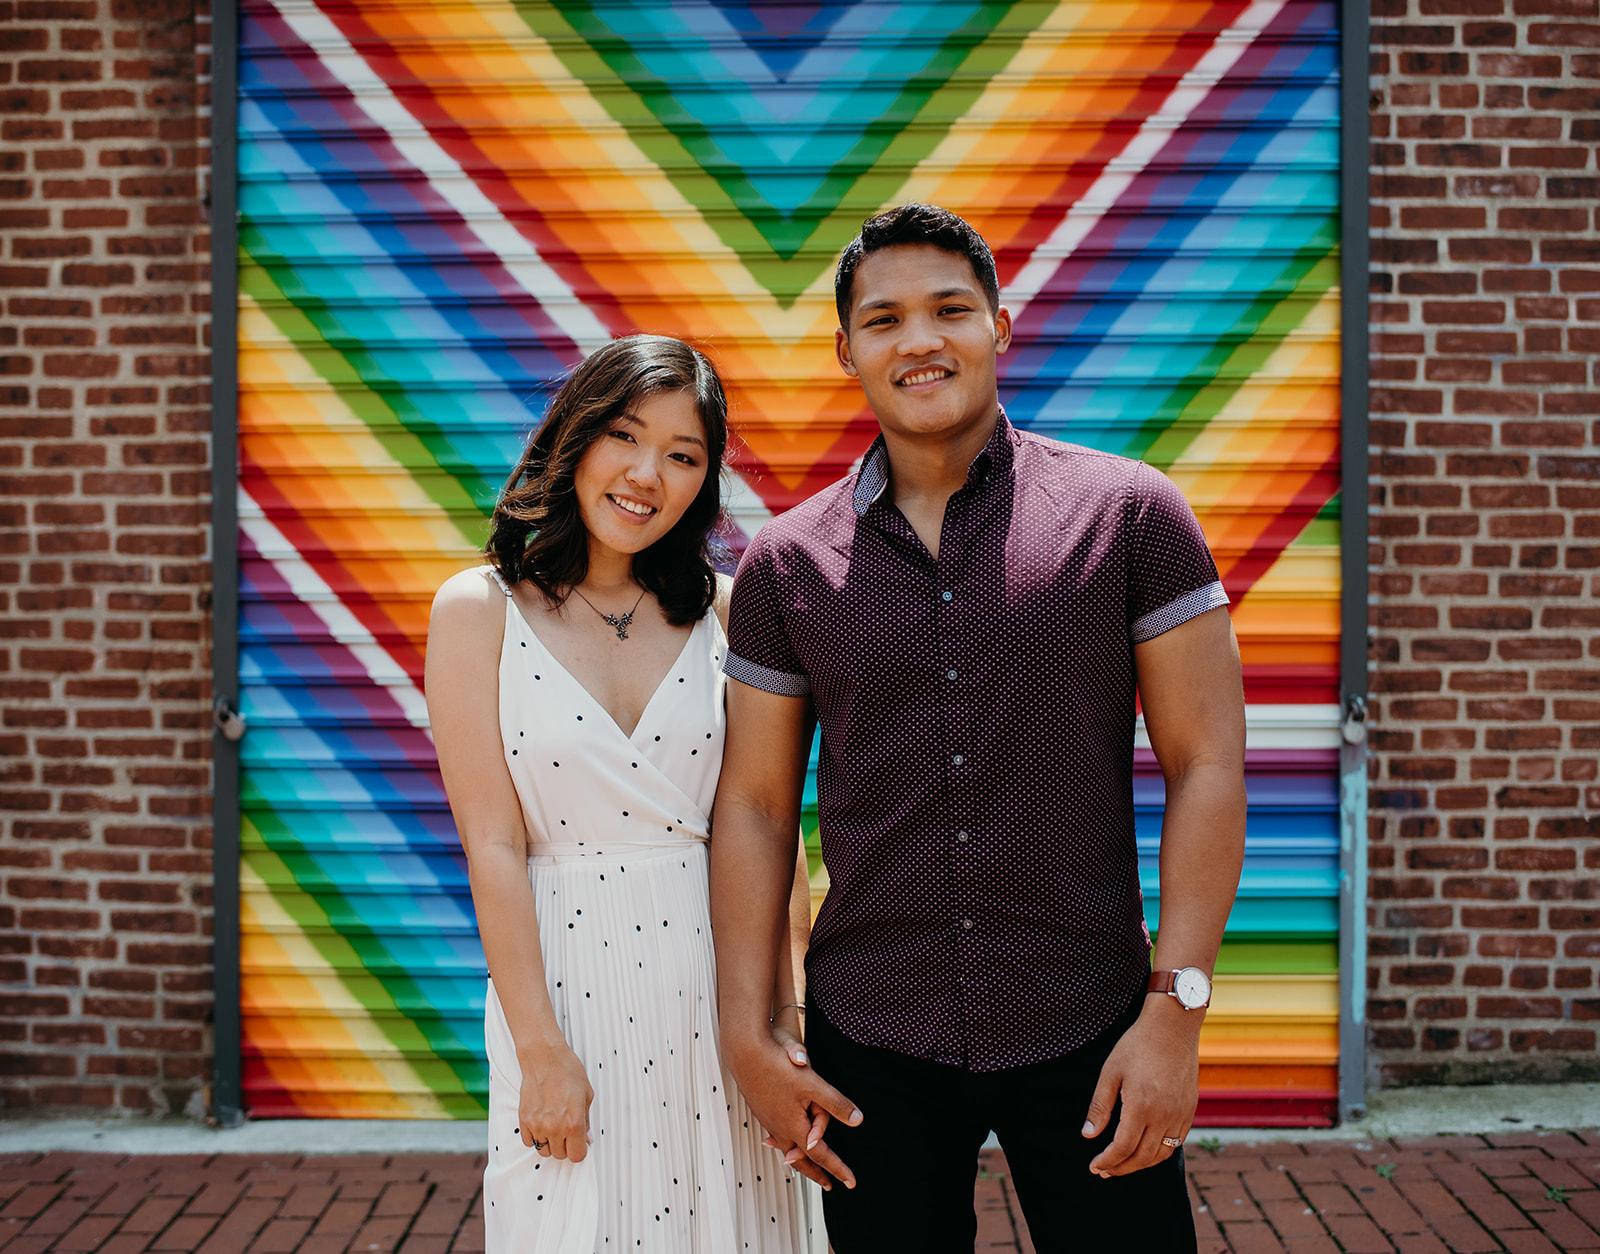 Washington DC love mural engagement session colorful rainbow smiles